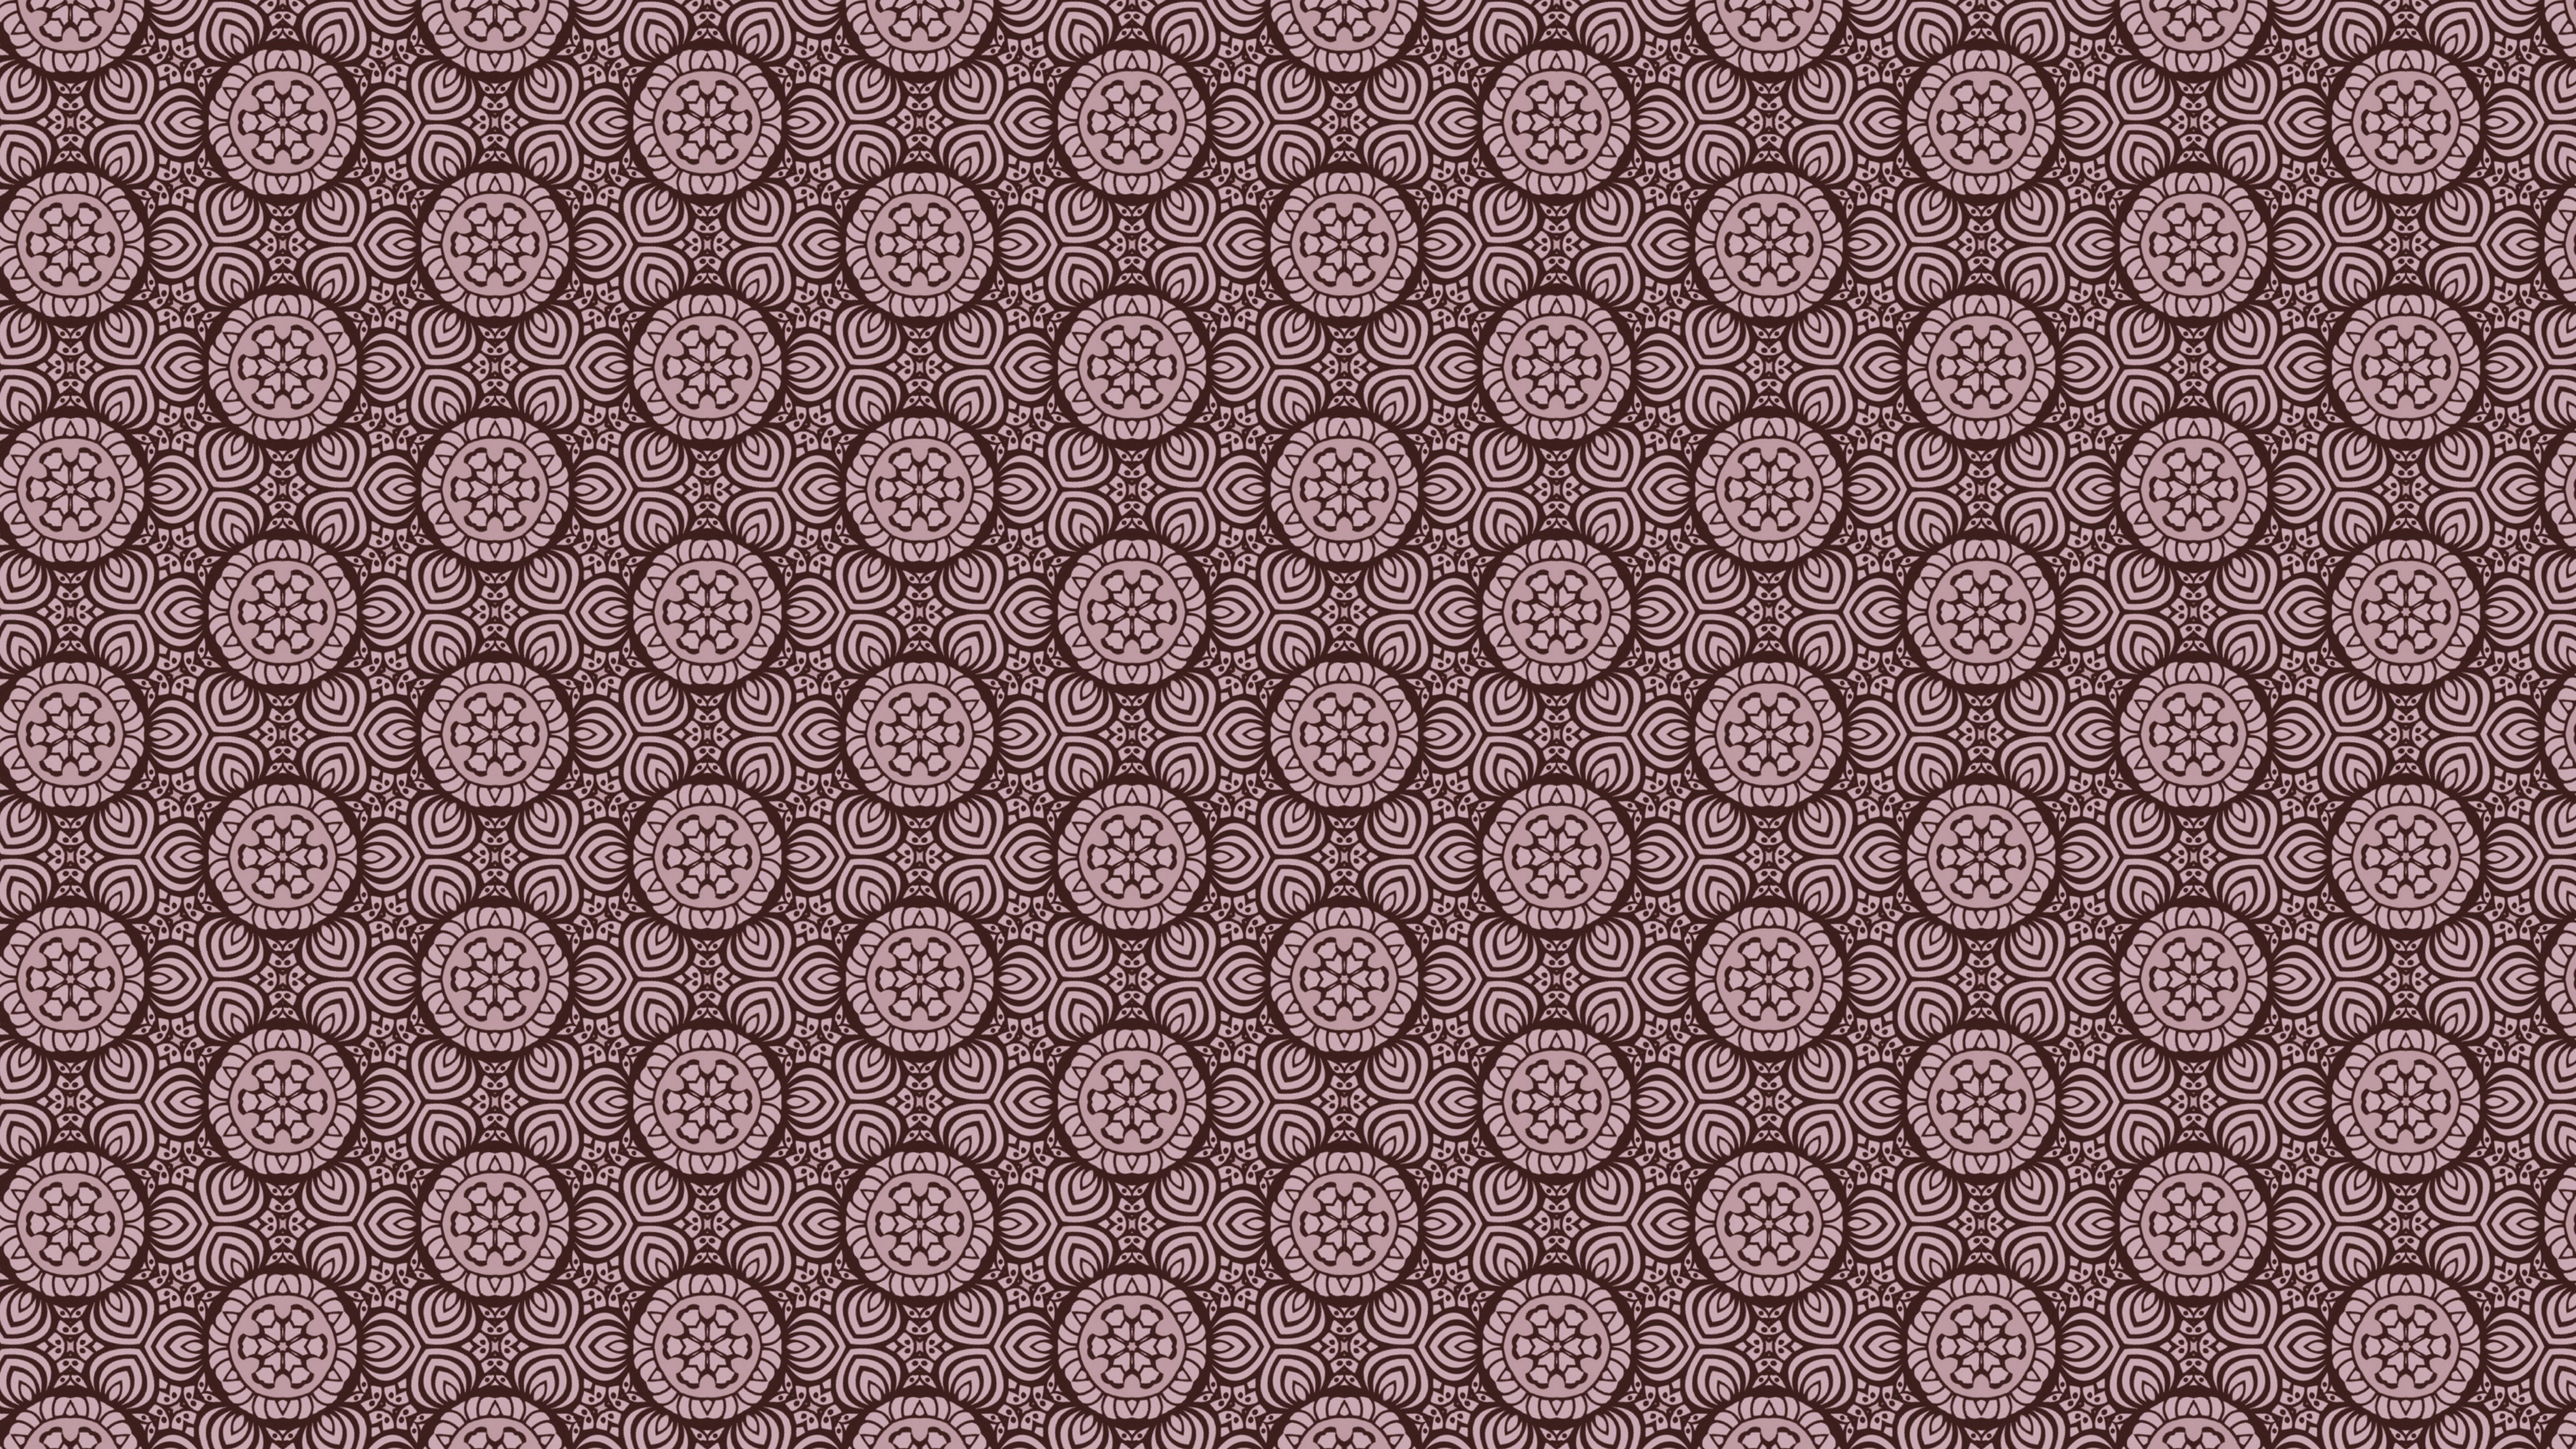 Pink Vintage Floral Seamless Pattern Wallpaper Design Template